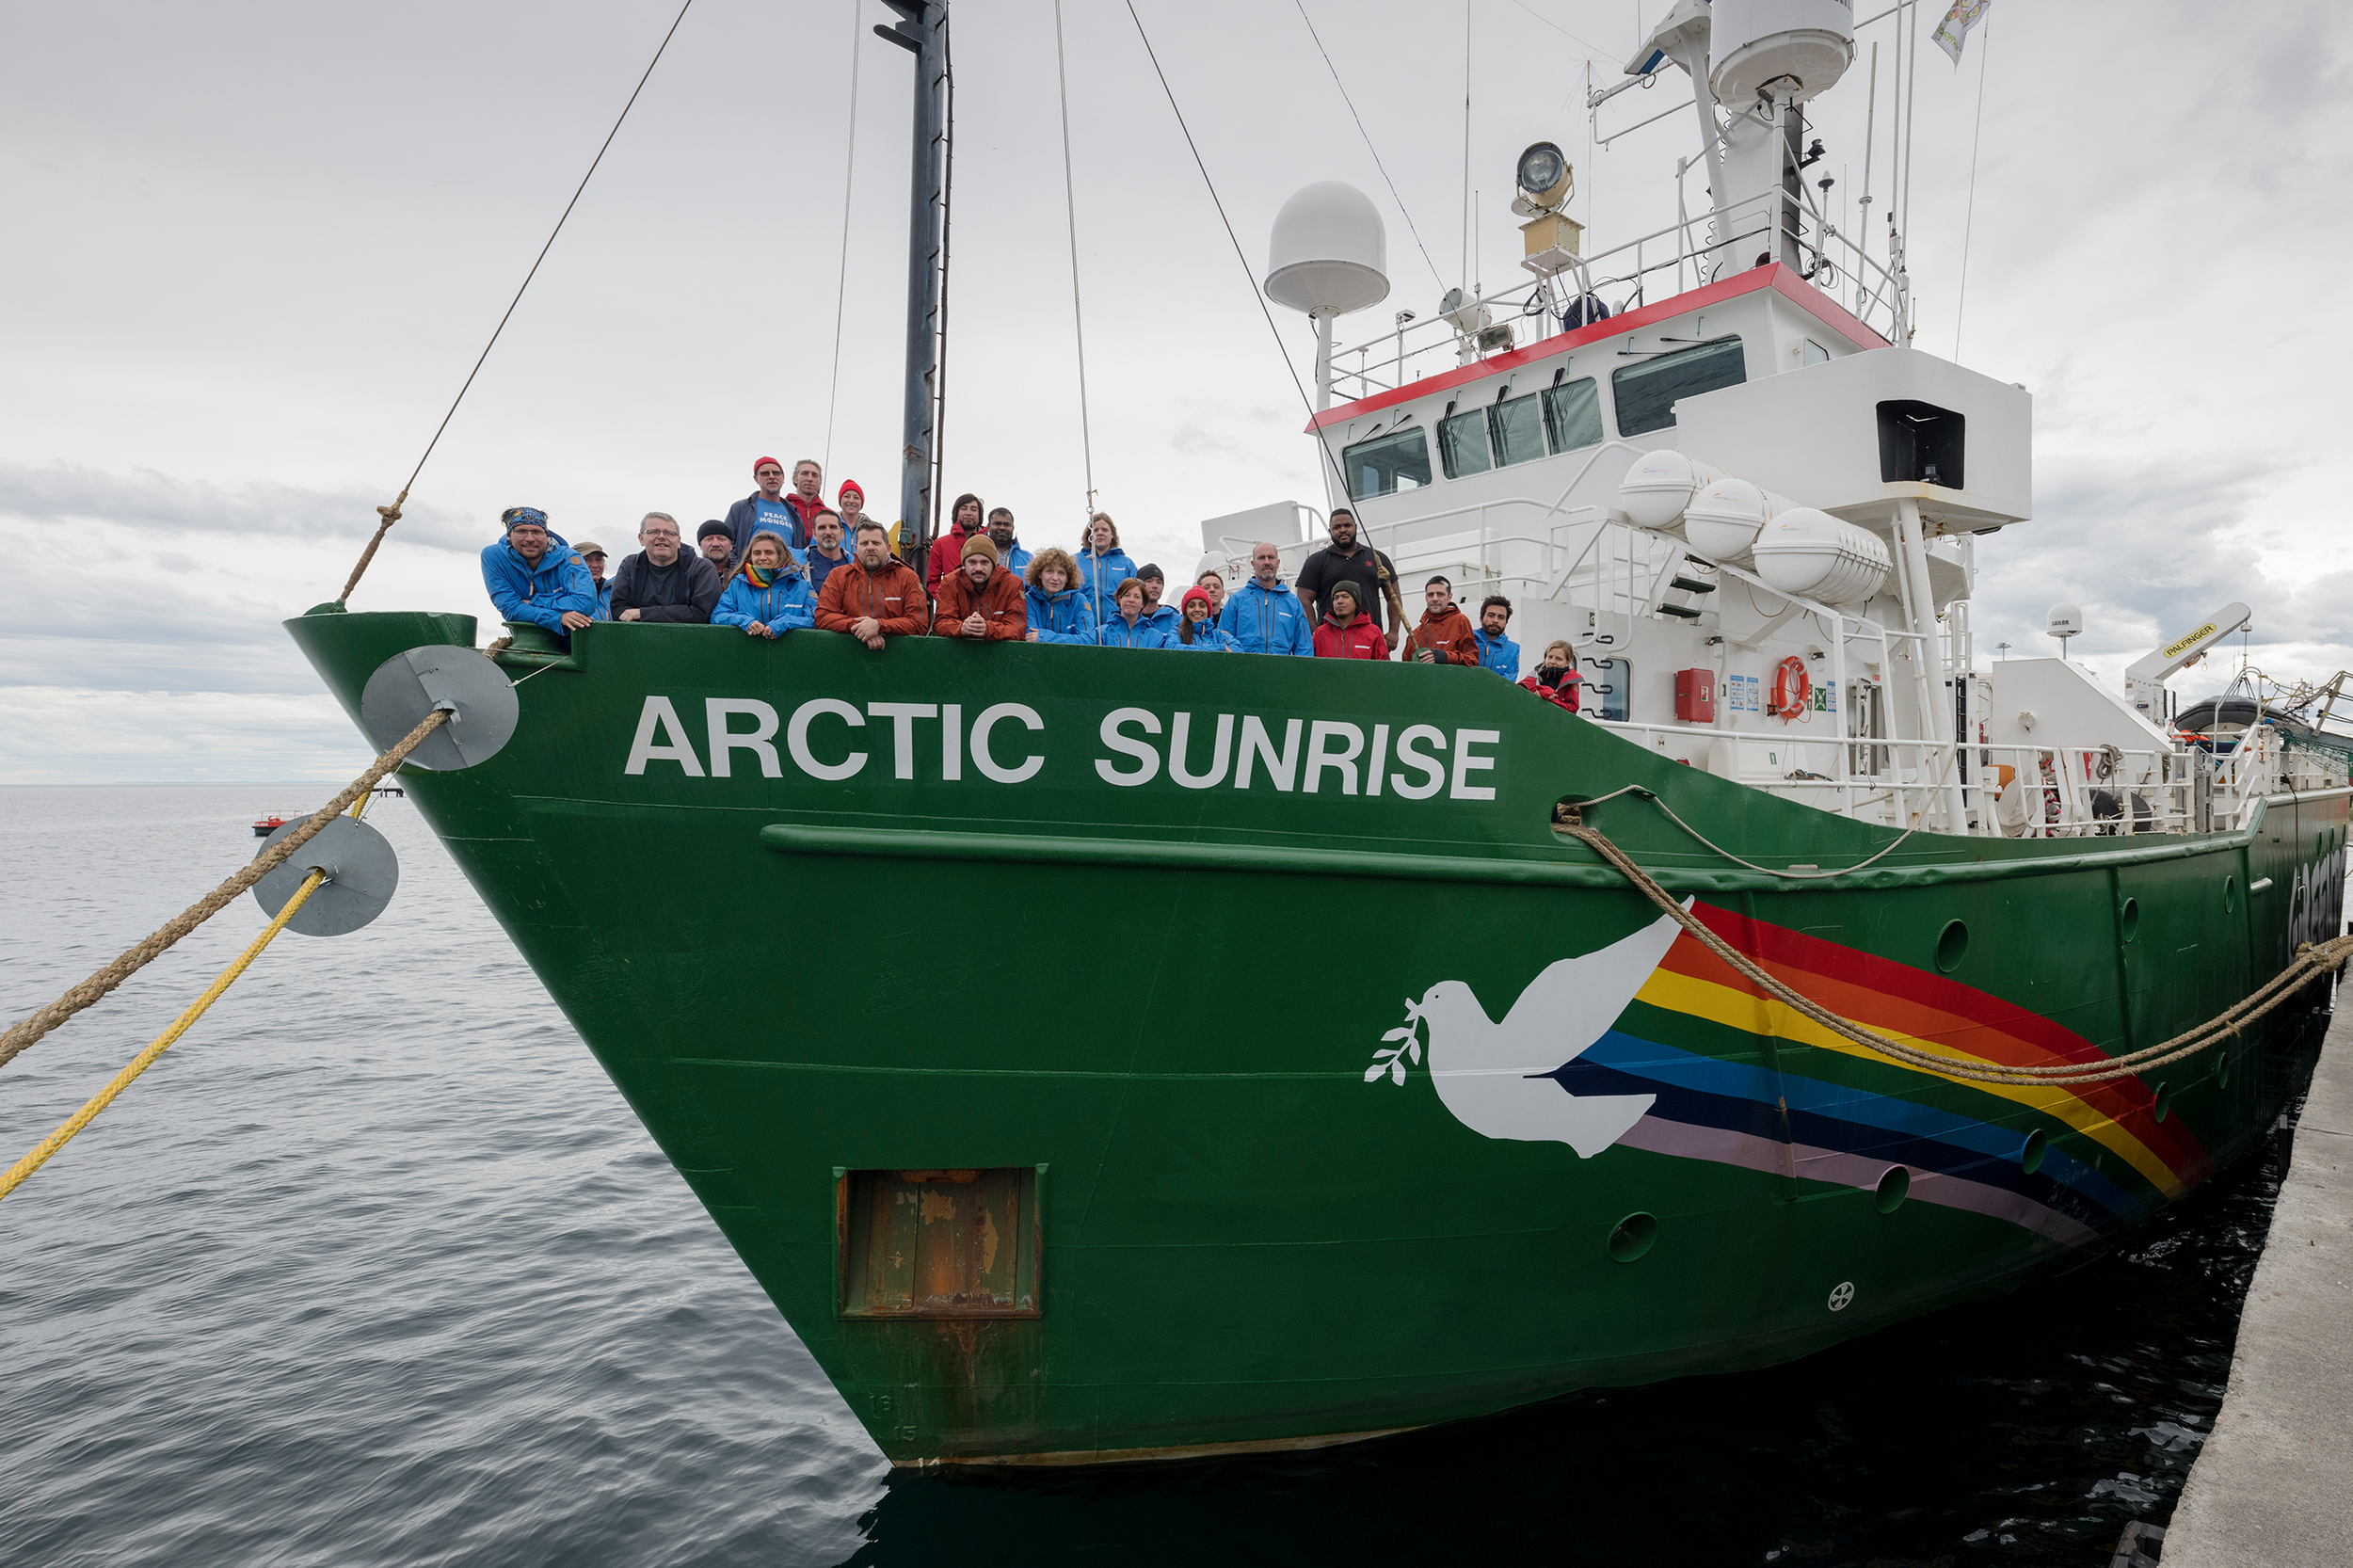 Arctic Sunrise and Crew in Chile © Christian Åslund / Greenpeace